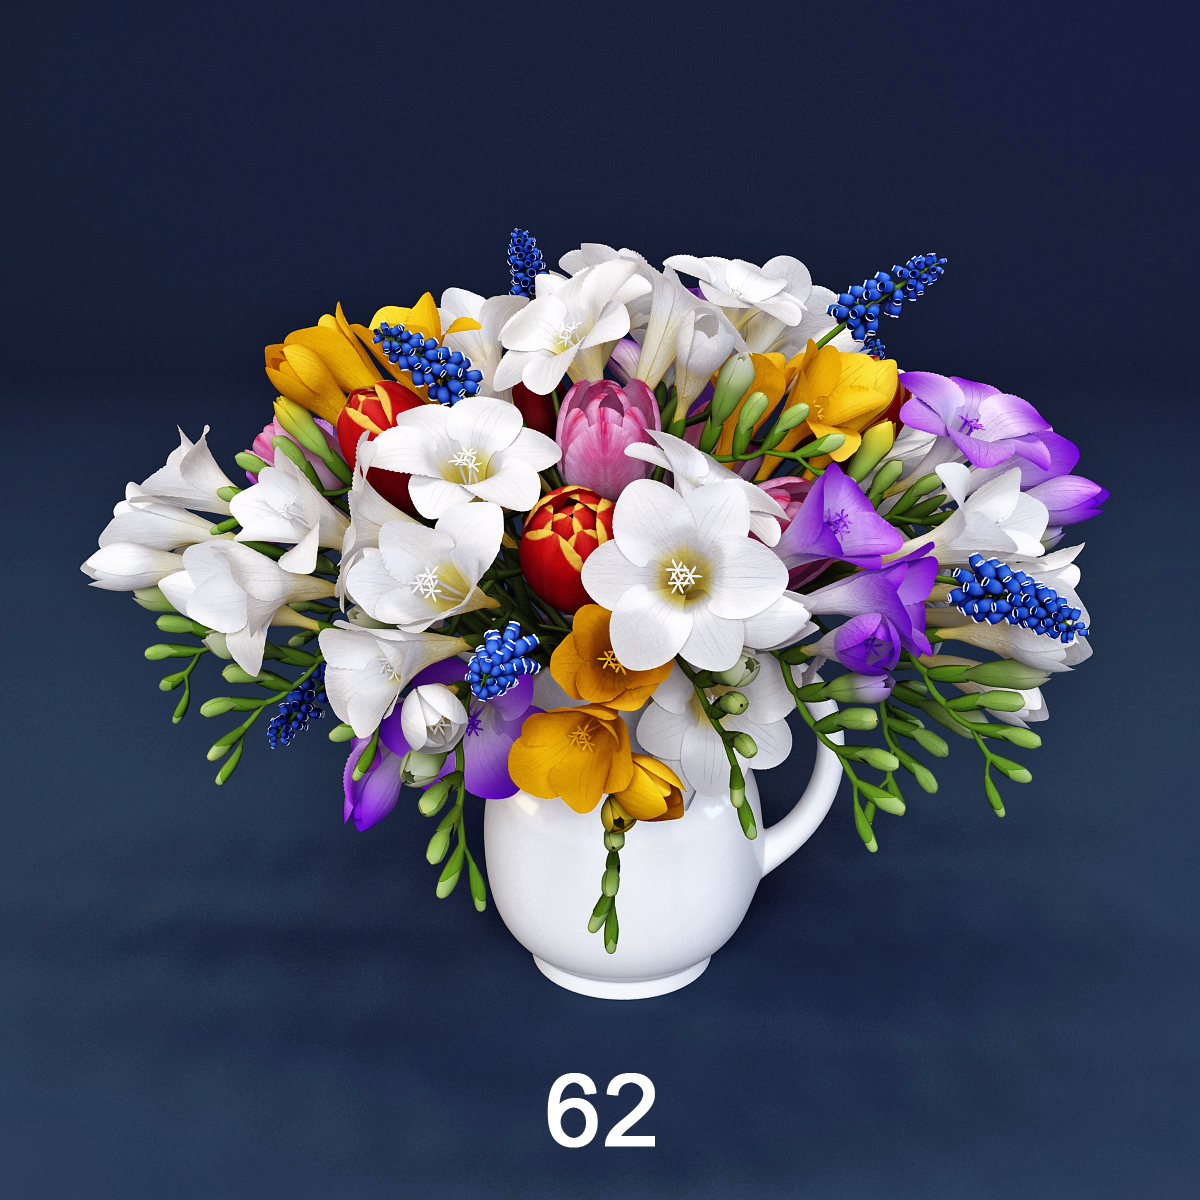 Generasim: Цветы - гиацинт фрезия, тюльпаны